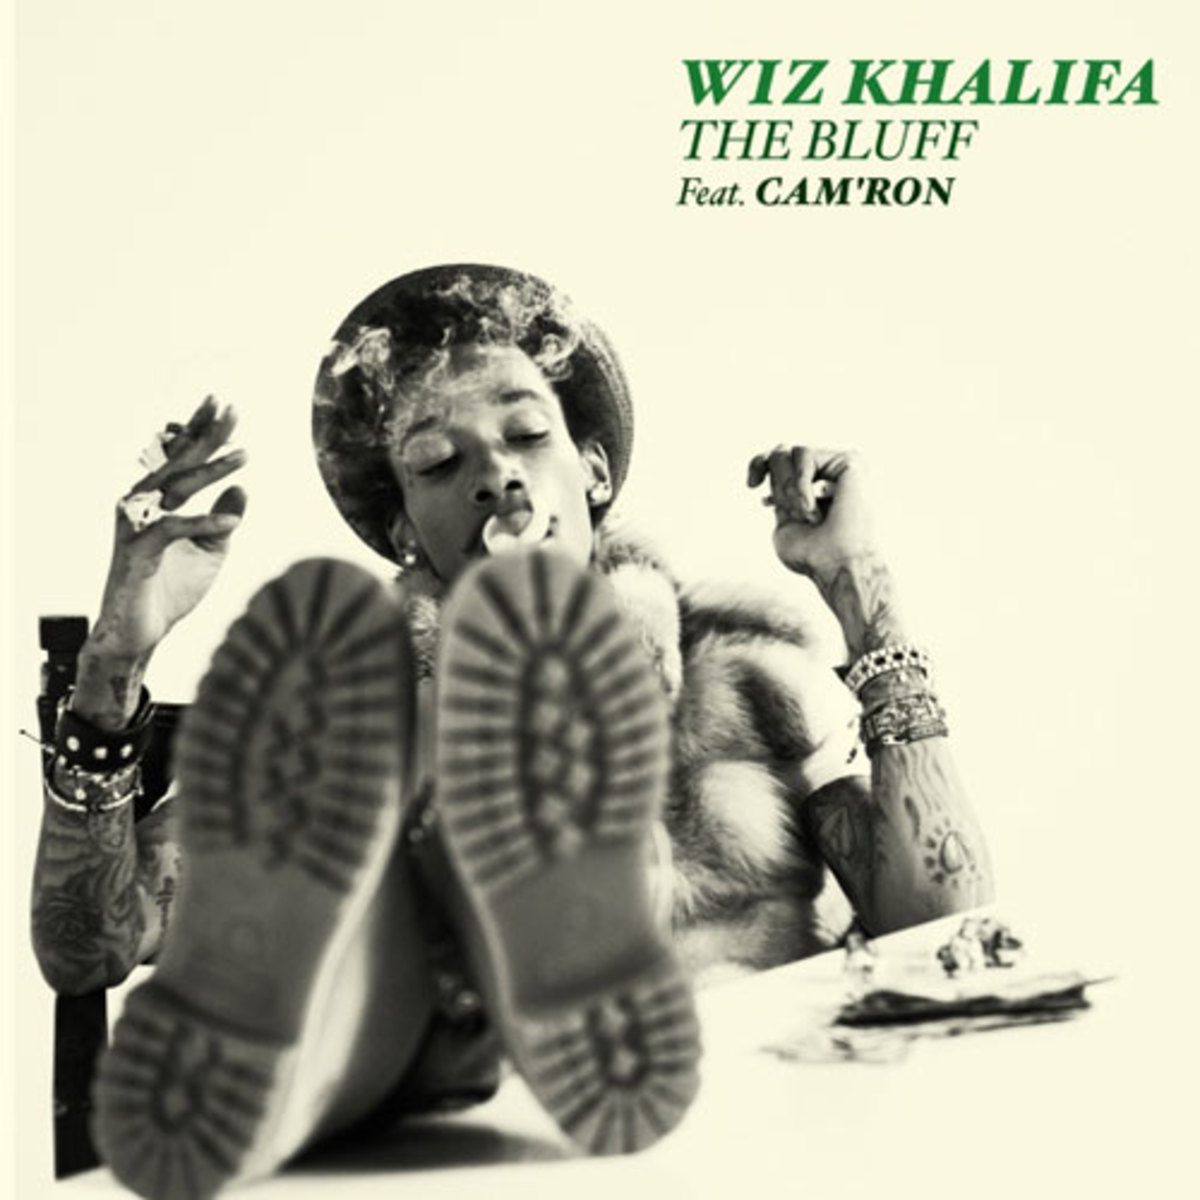 wizkhalifa-thebluff.jpg